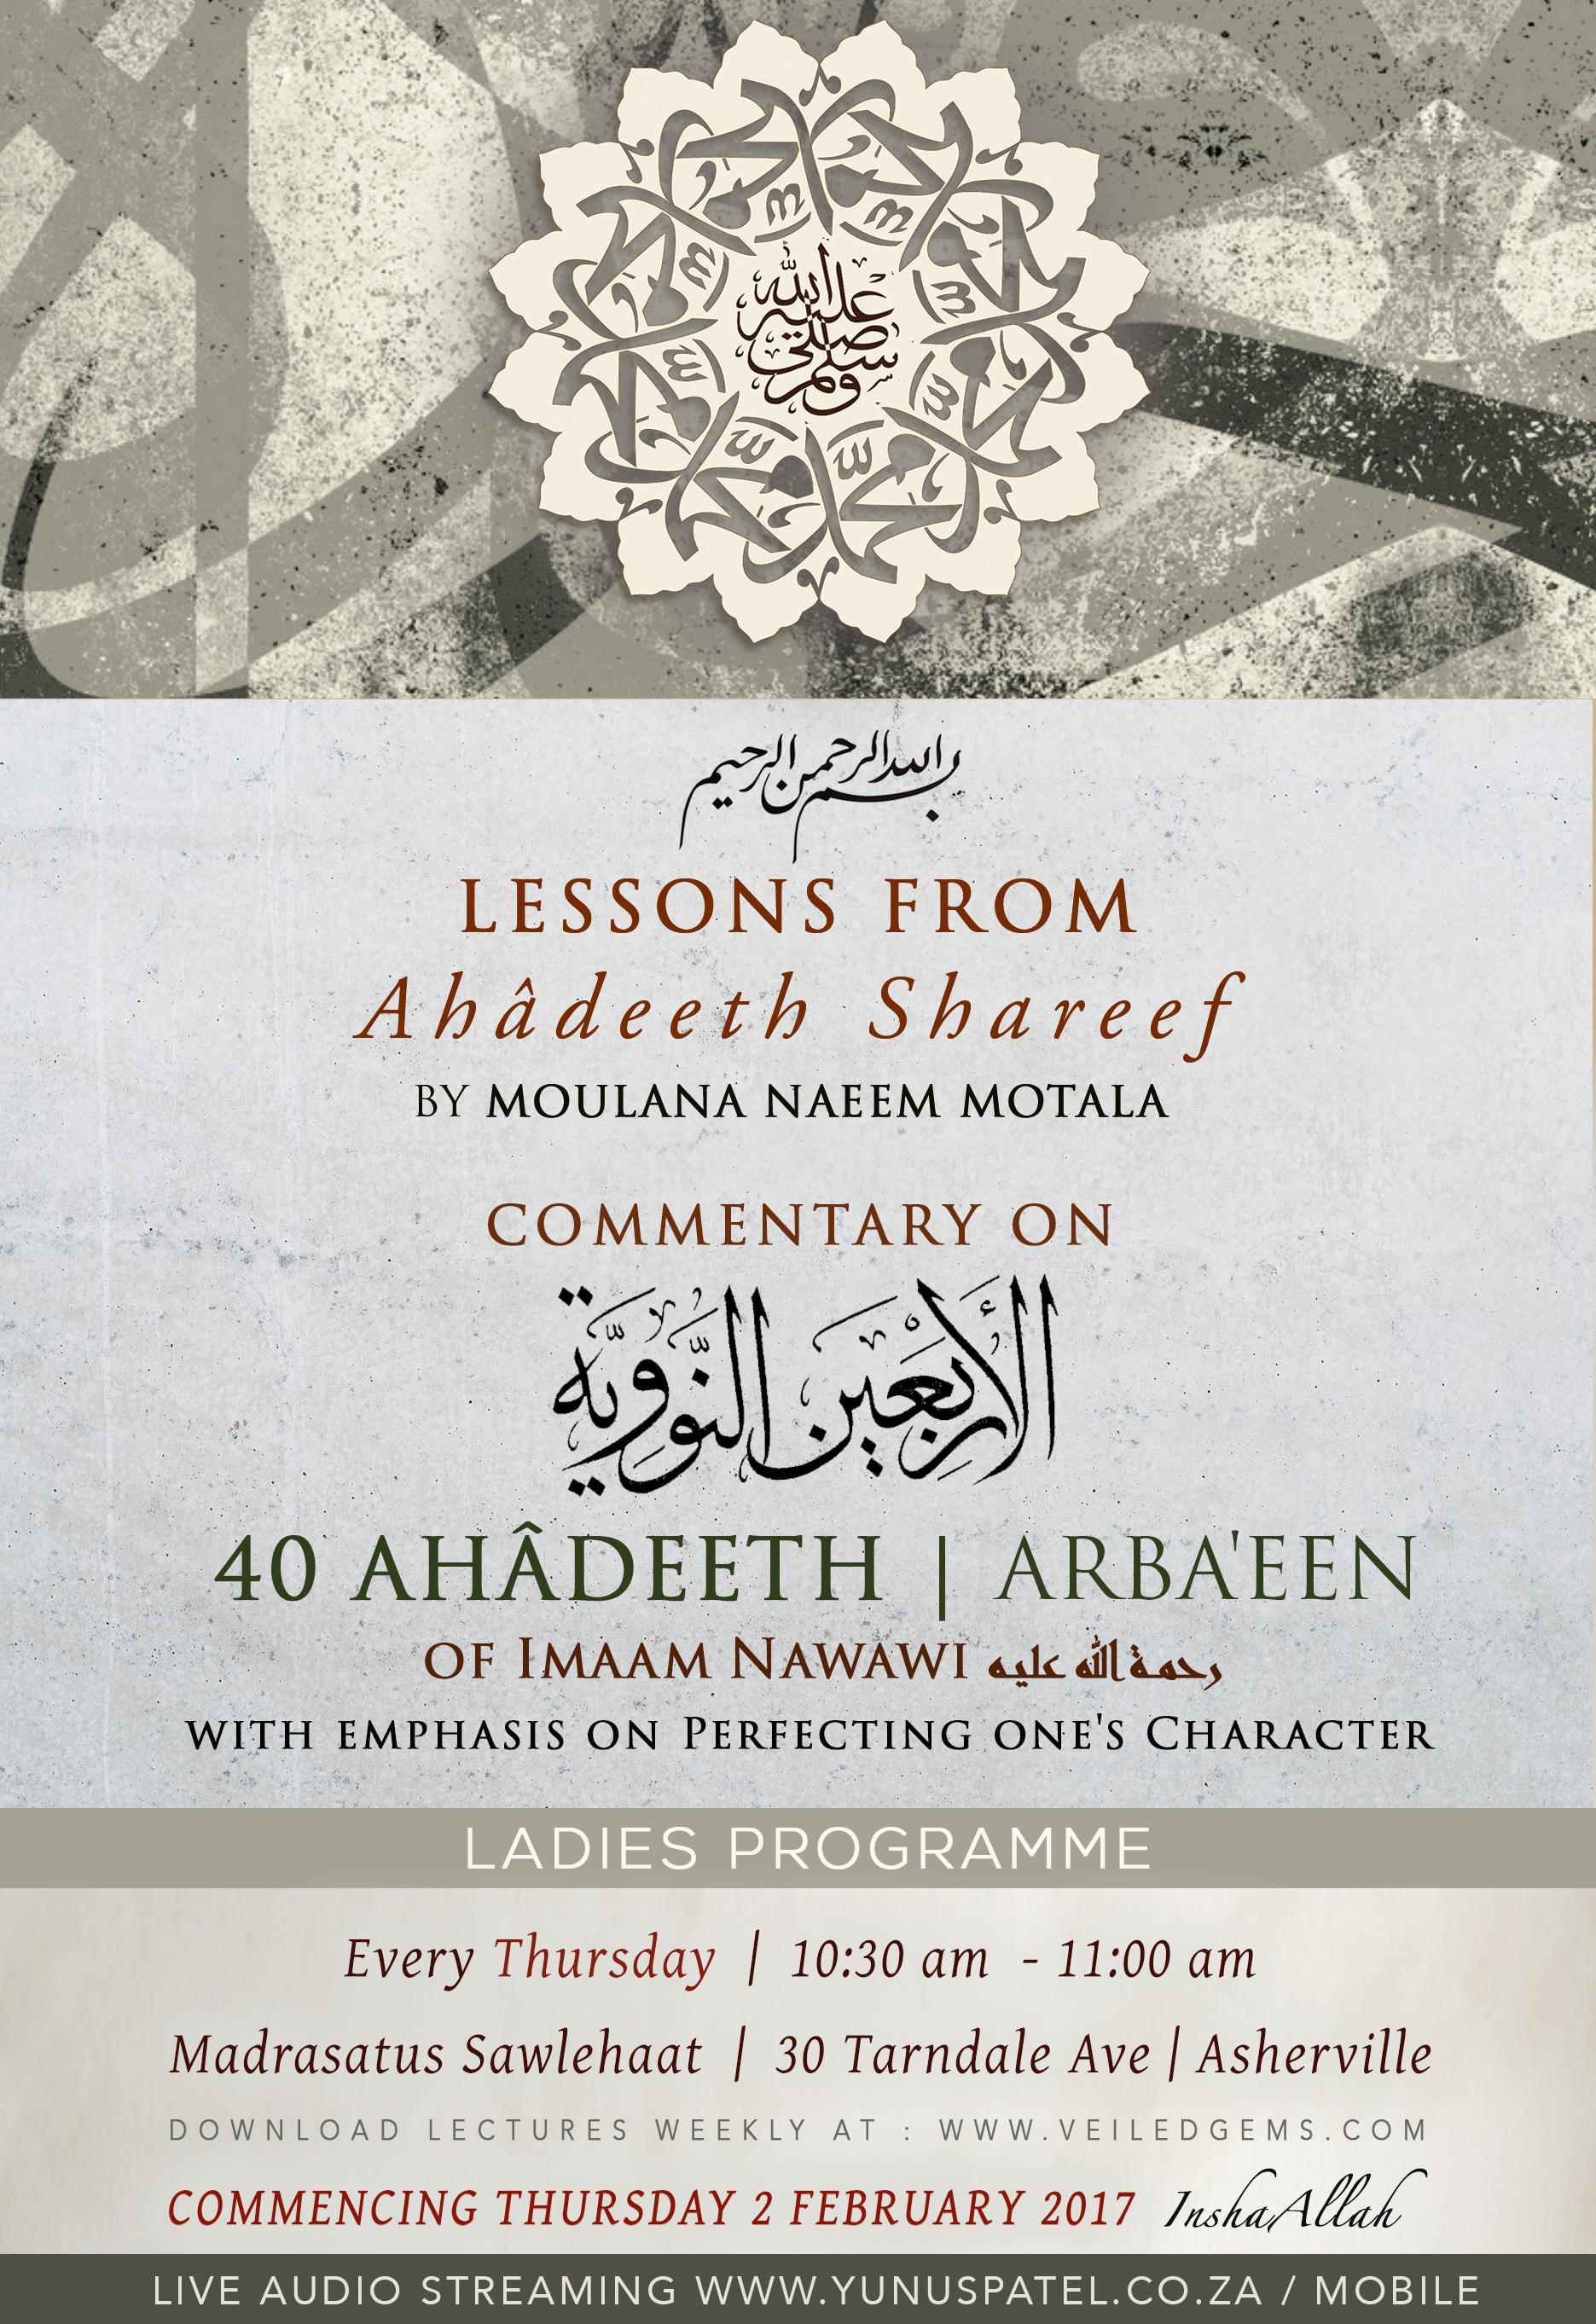 Innamal A Malu Binniyat Arabic : innamal, binniyat, arabic, Veiled, Towards, Reformation, Category, Archive, AHÂDEETH, ARBA'EEN